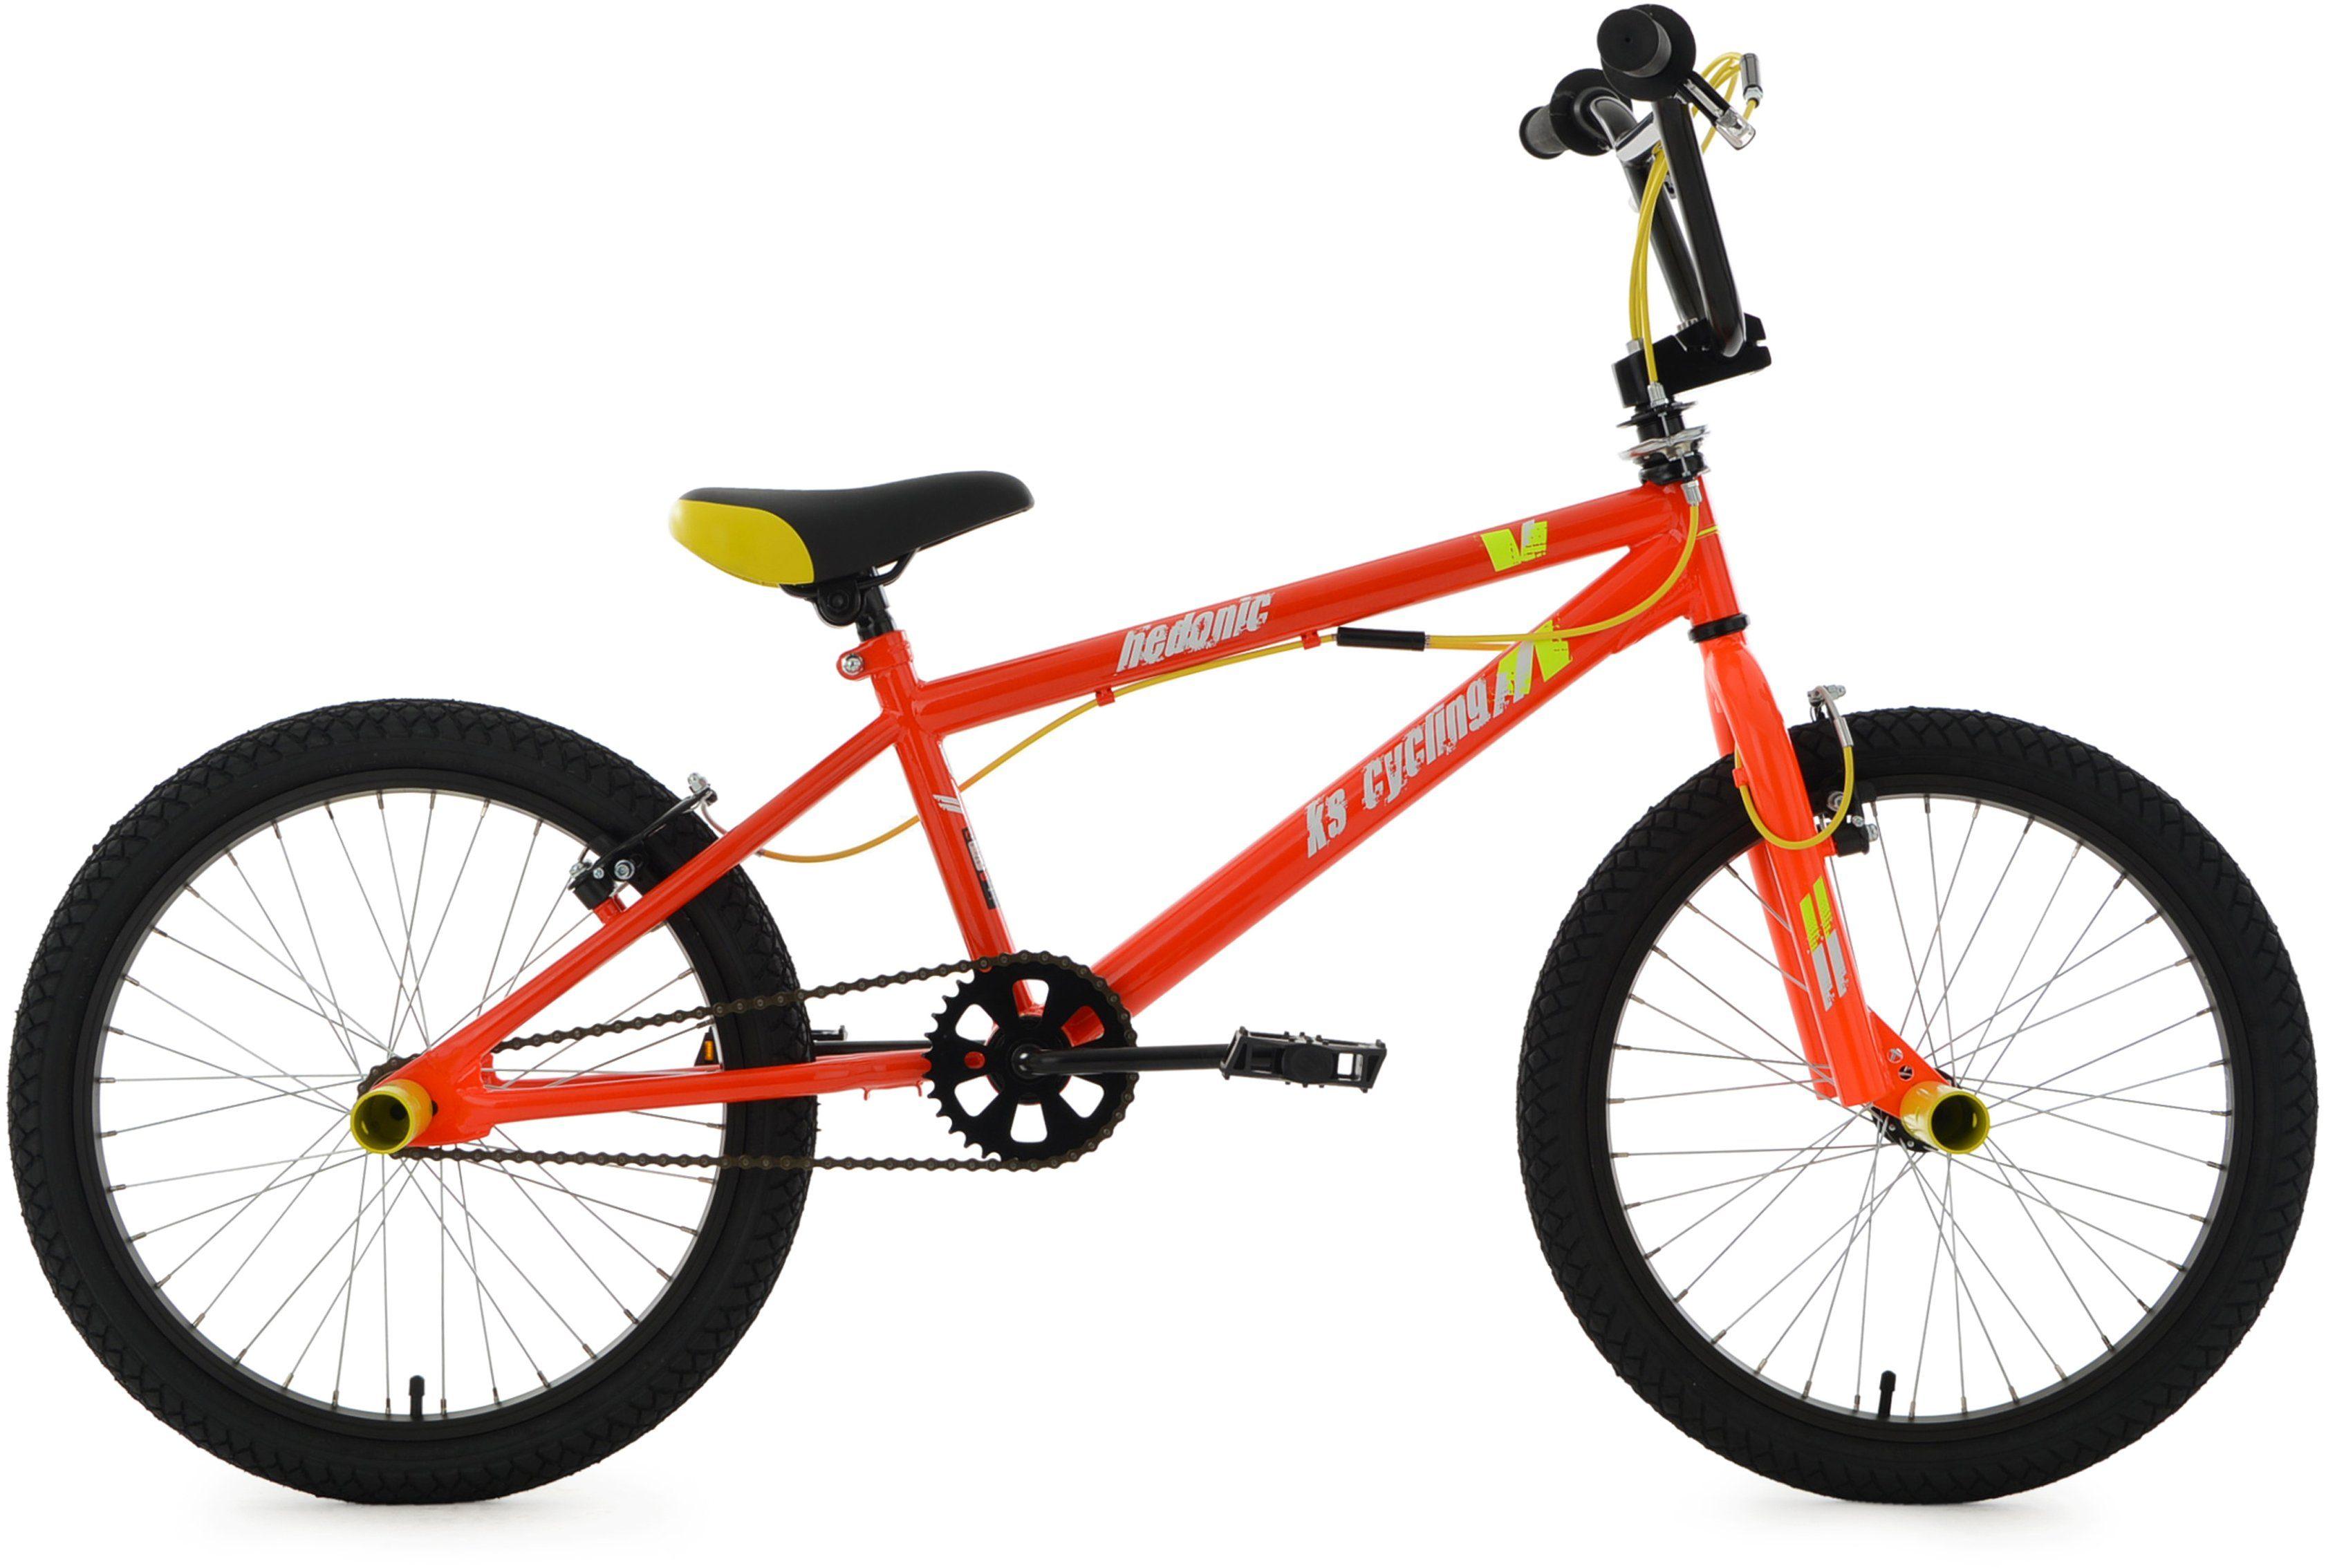 KS Cycling BMX Fahrrad, 20 Zoll, orange-gelb, »Hedonic«